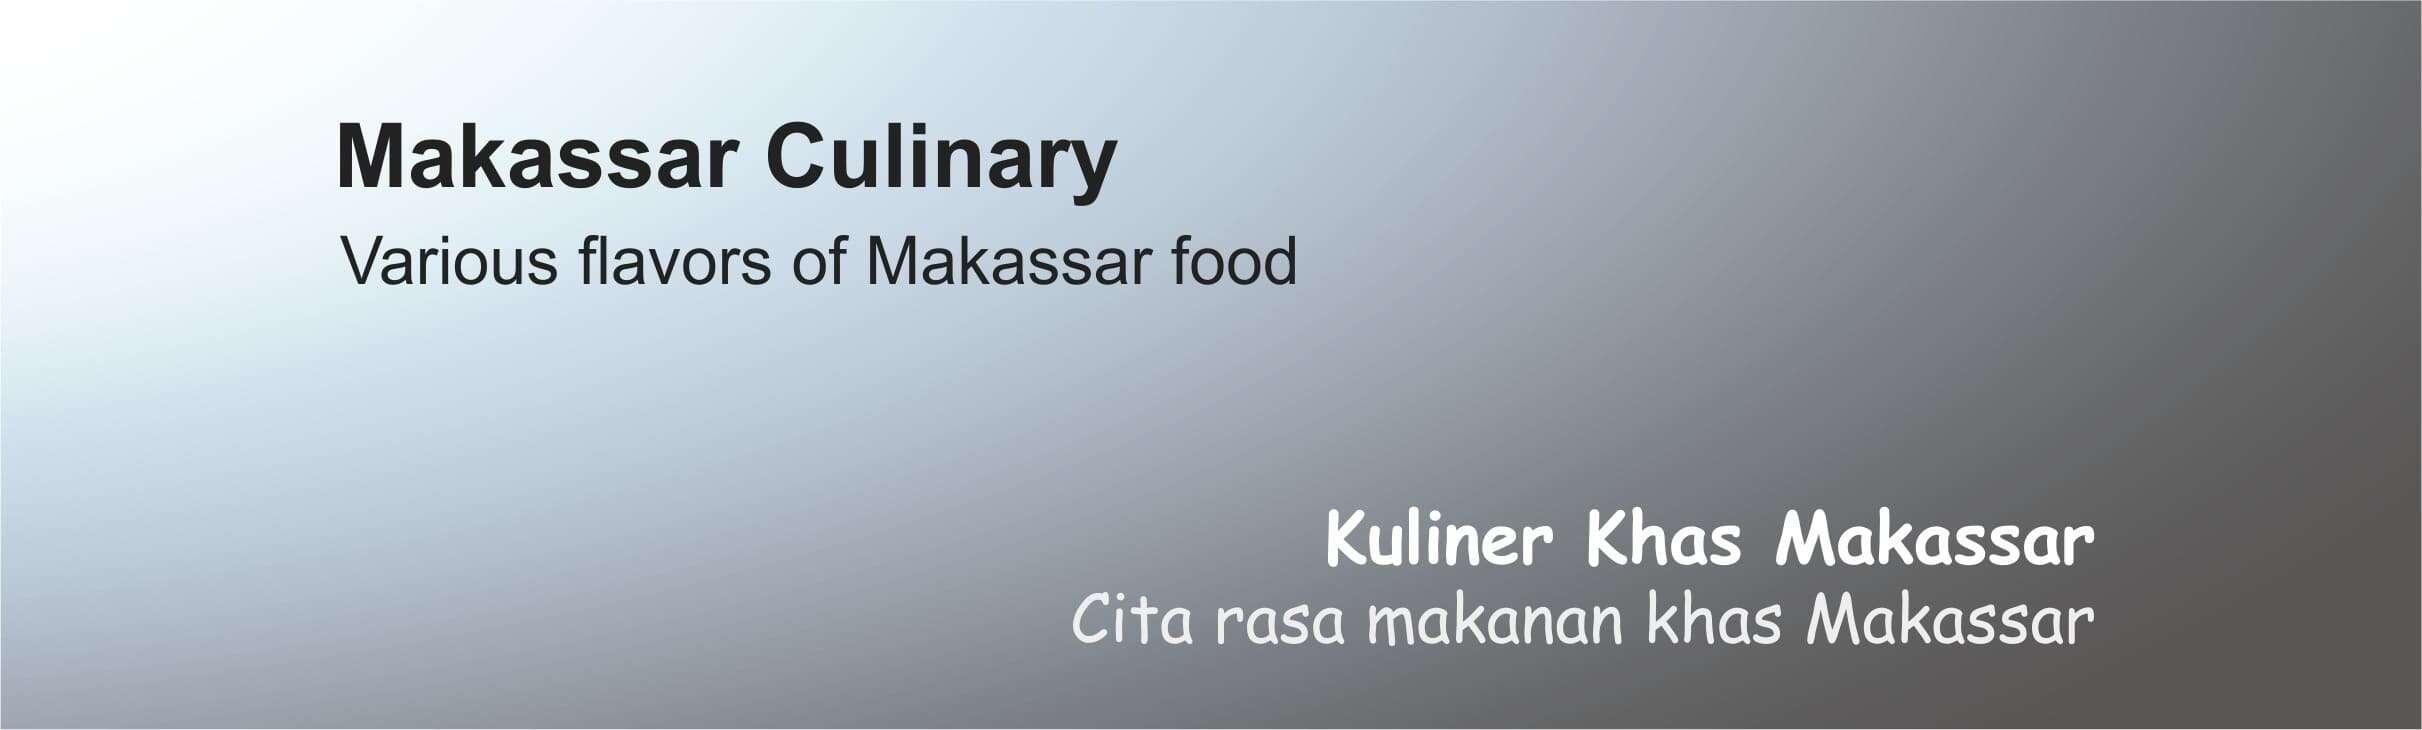 kuliner khas makassar